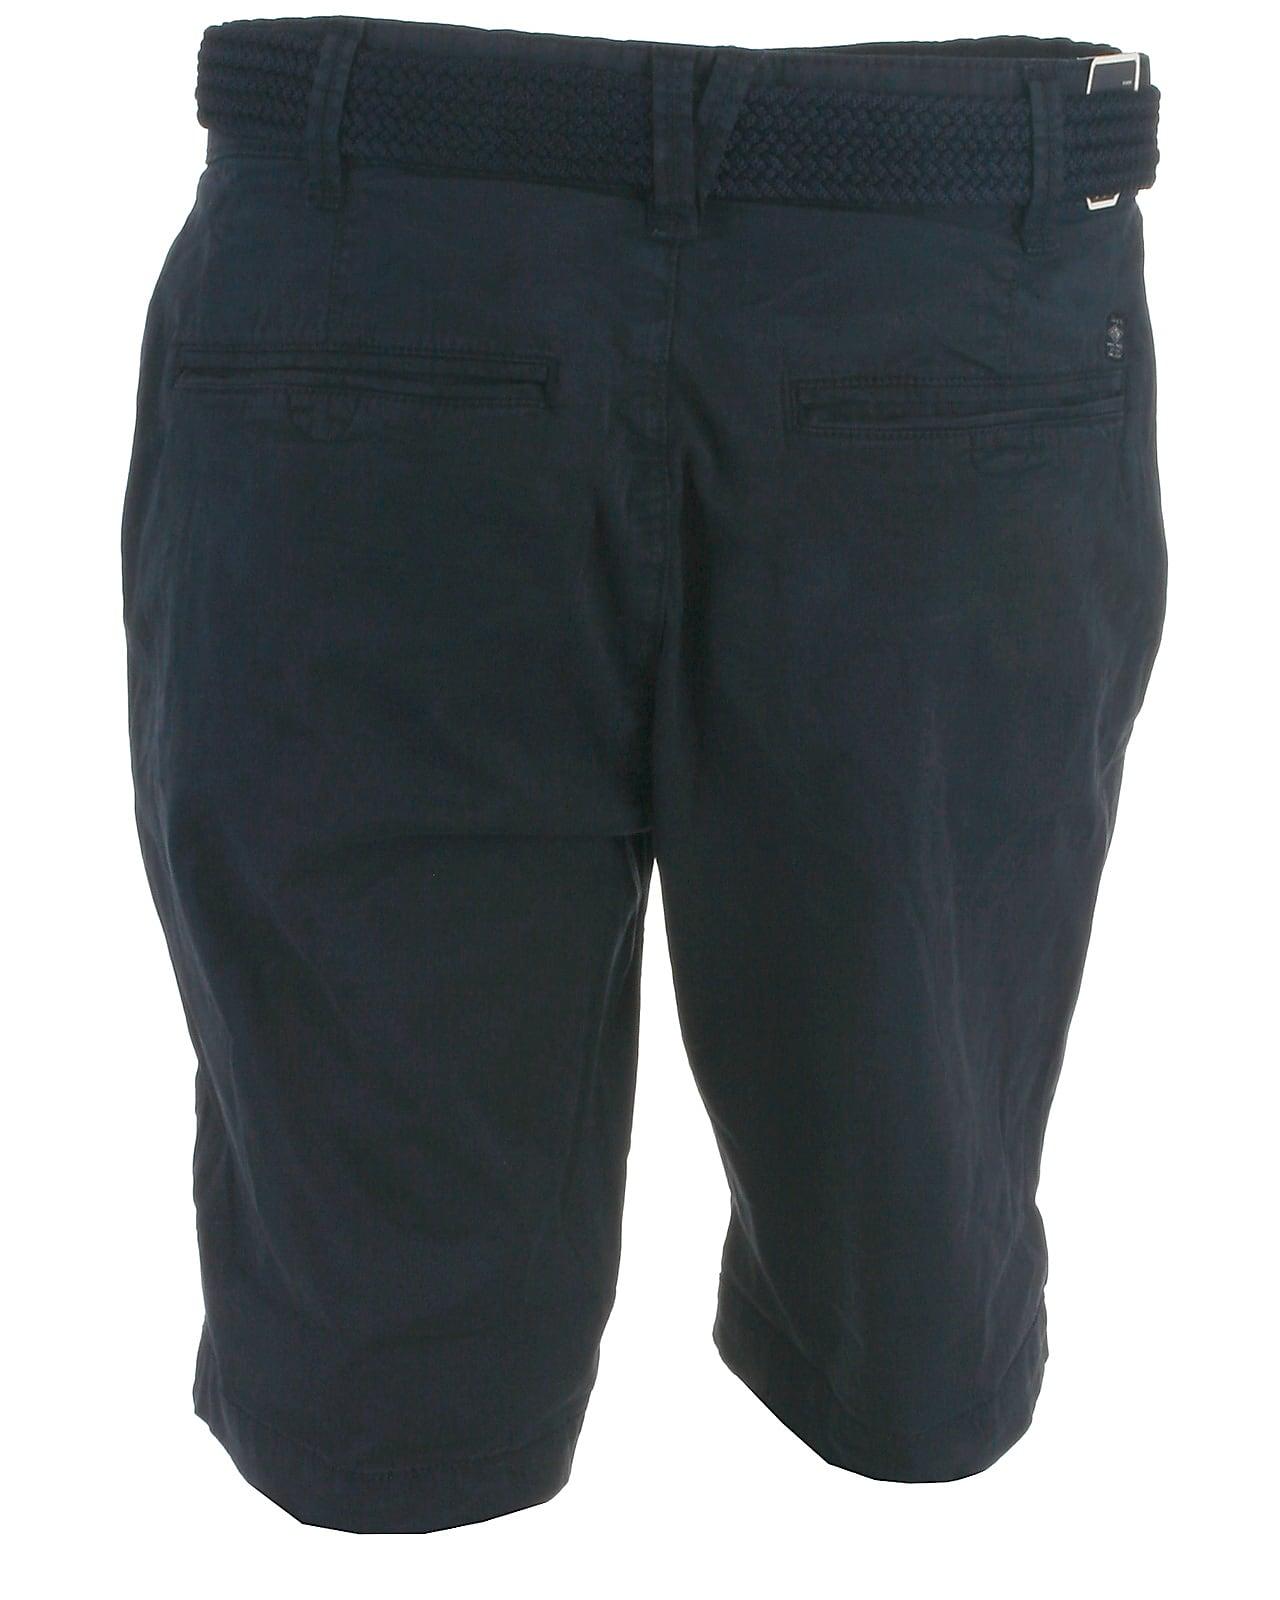 Image of Petrol chino shorts, darknavy